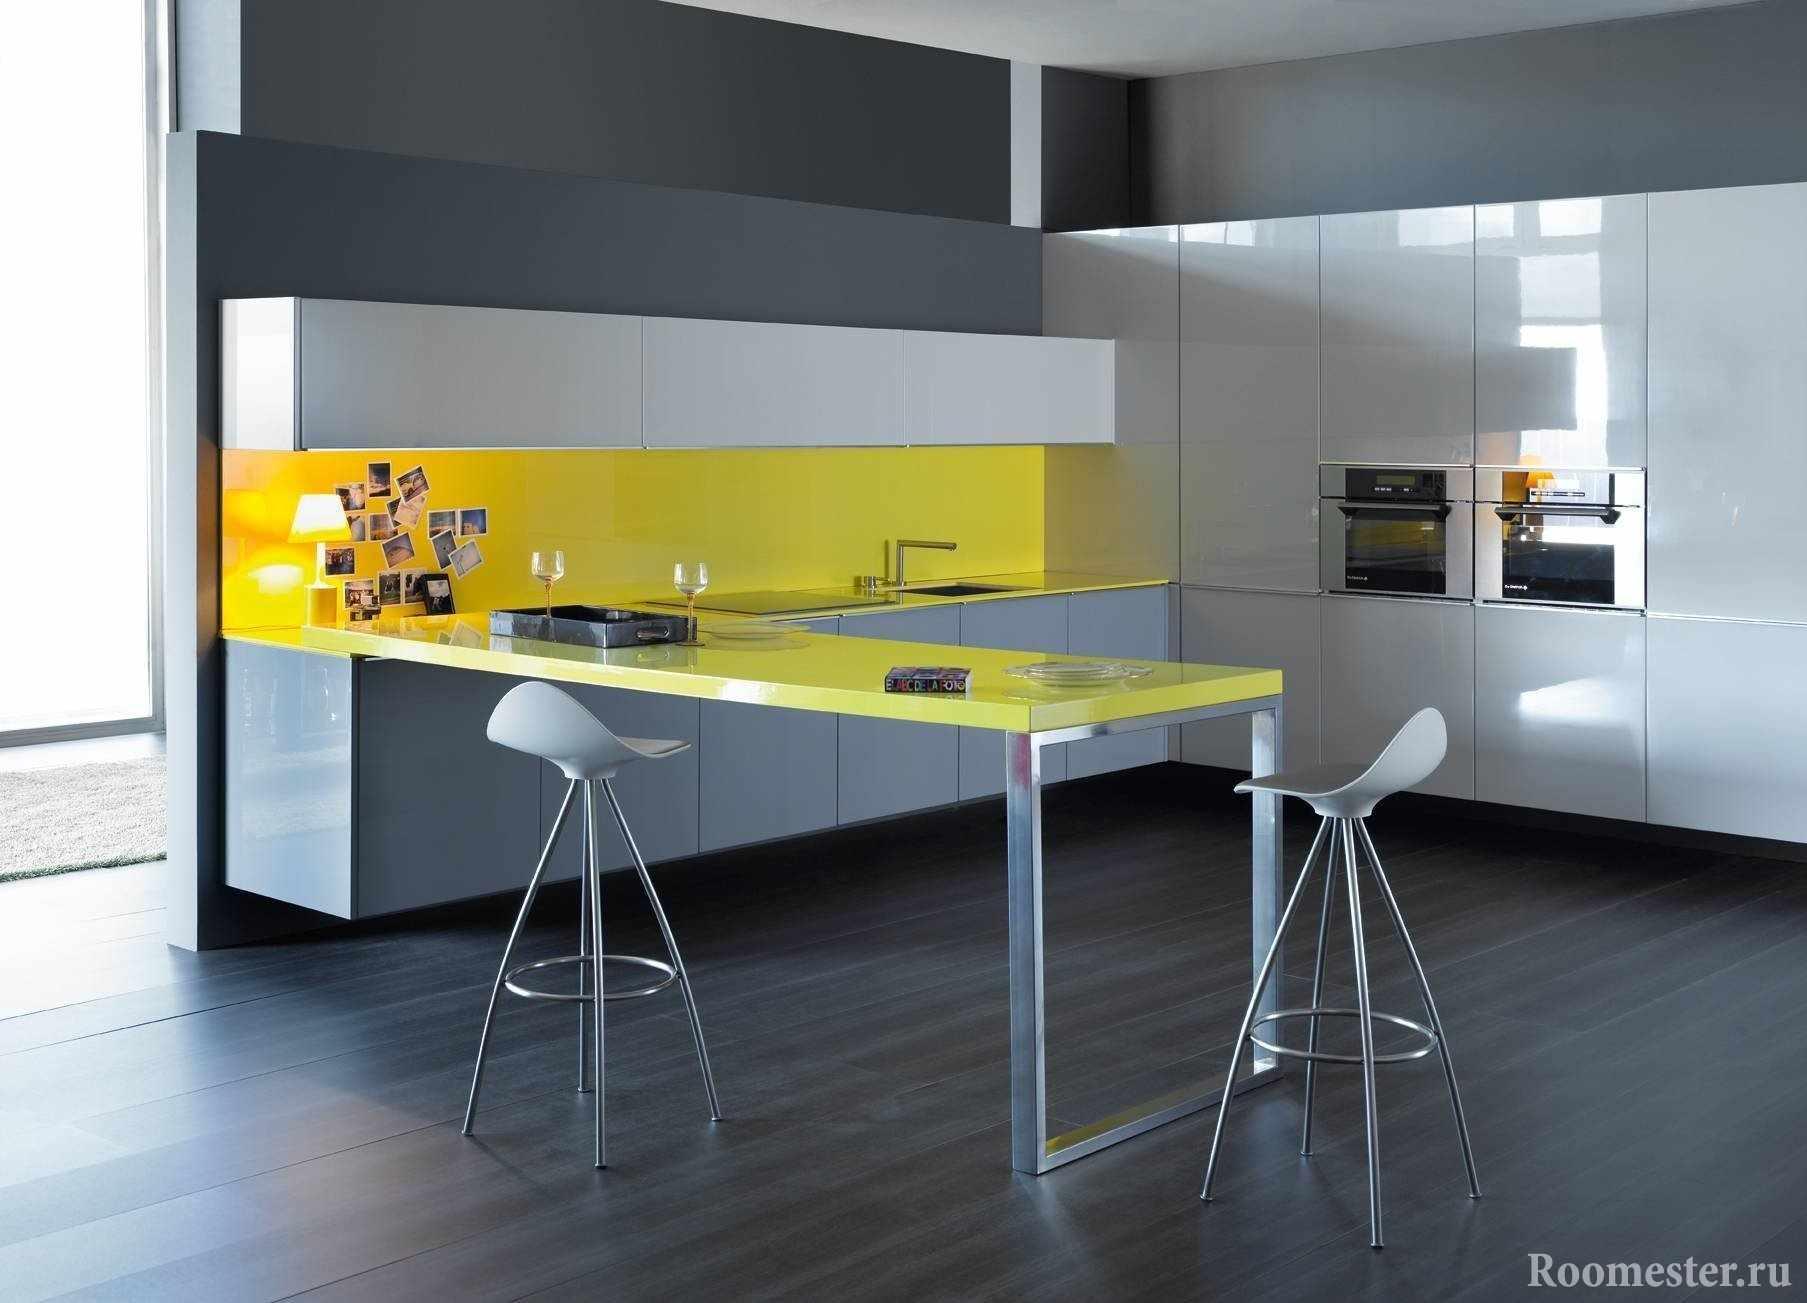 Желто-серый дизайн кухни